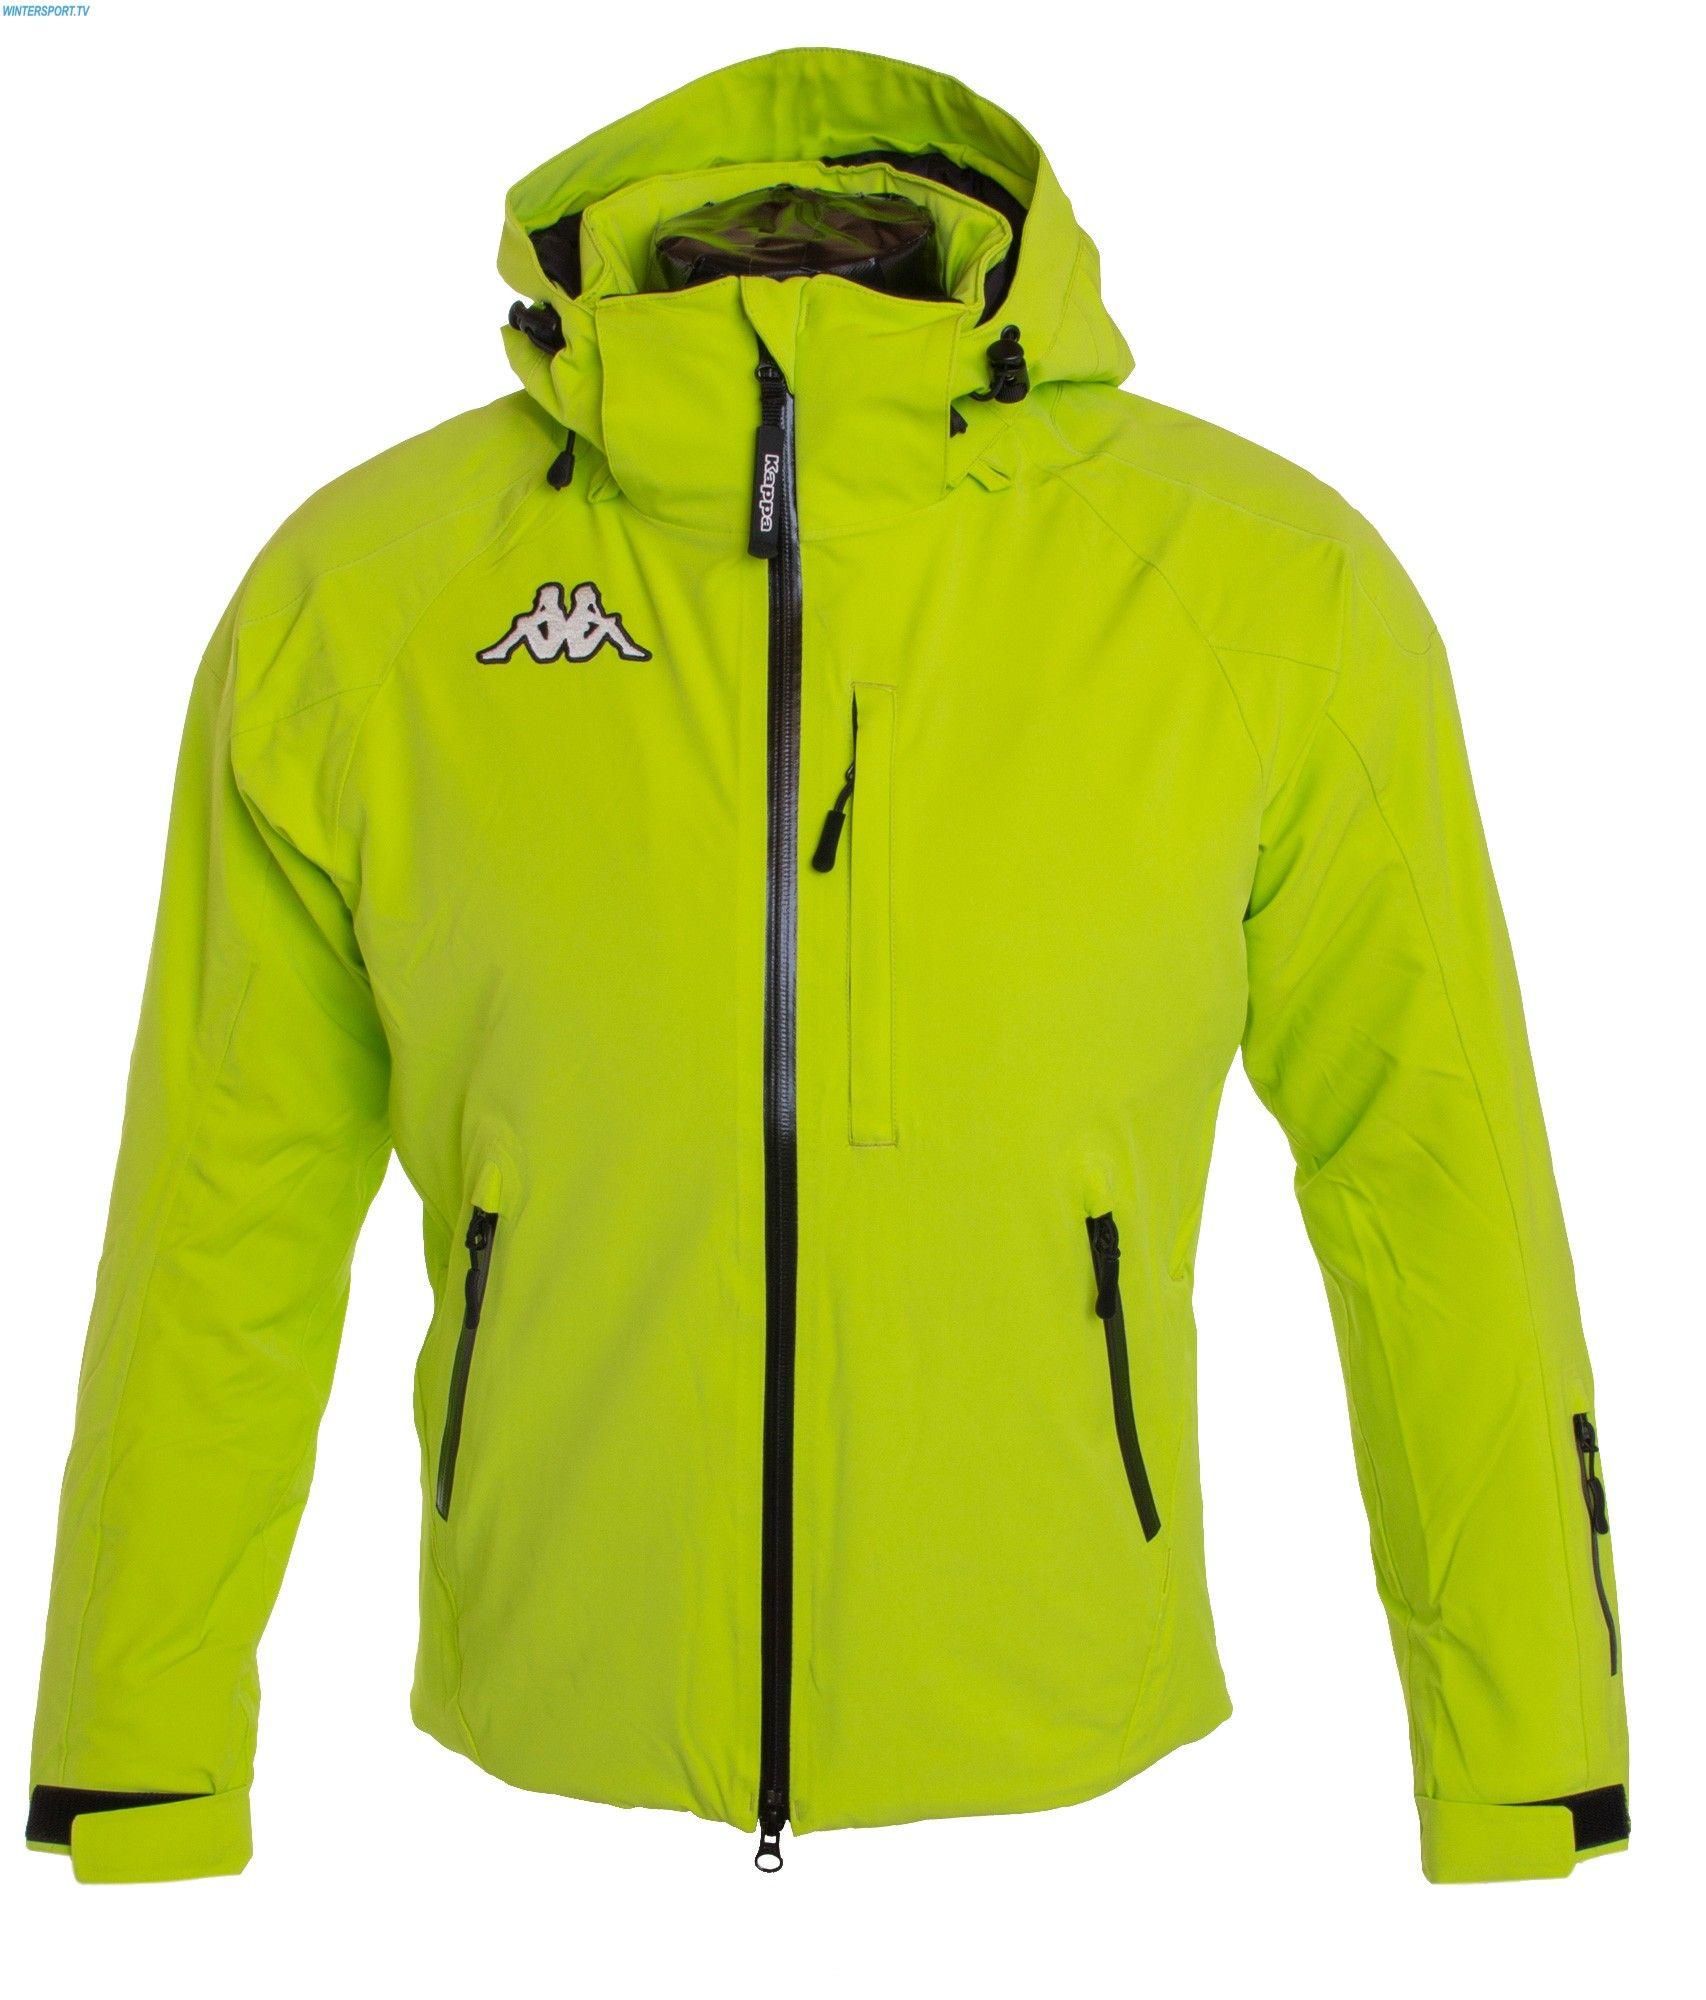 kappa men 6cento 650 jacket \u2013 green lime kappa ski wear kappa  kappa men 6cento 650 jacket \u2013 green lime